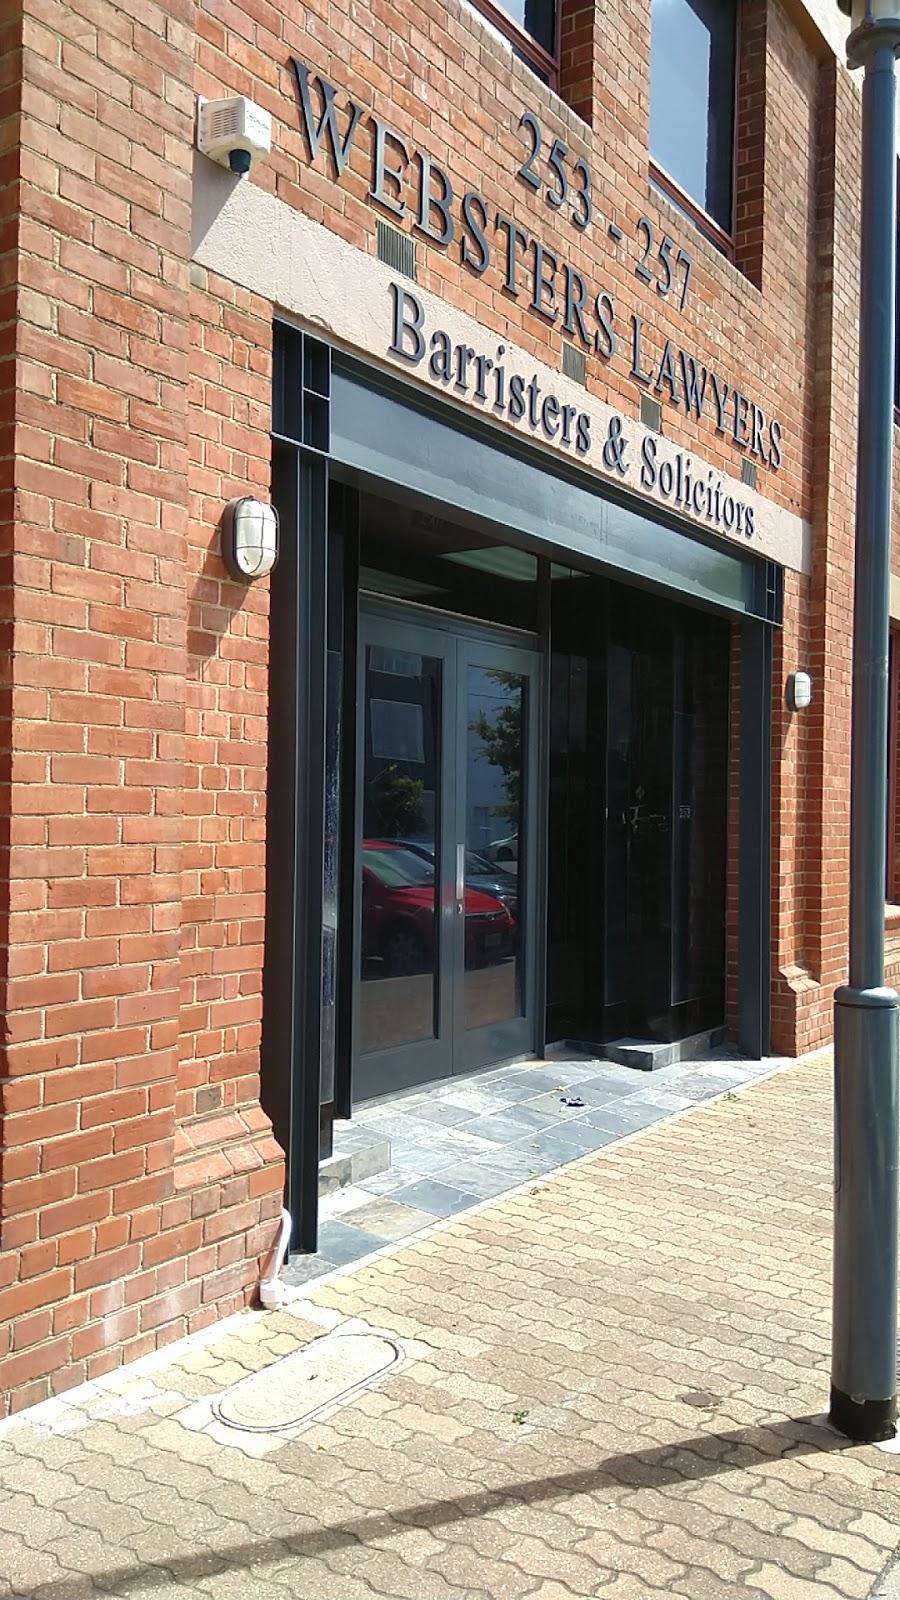 Websters Lawyers | lawyer | 253/257 Sturt St, Adelaide SA 5000, Australia | 0882311363 OR +61 8 8231 1363